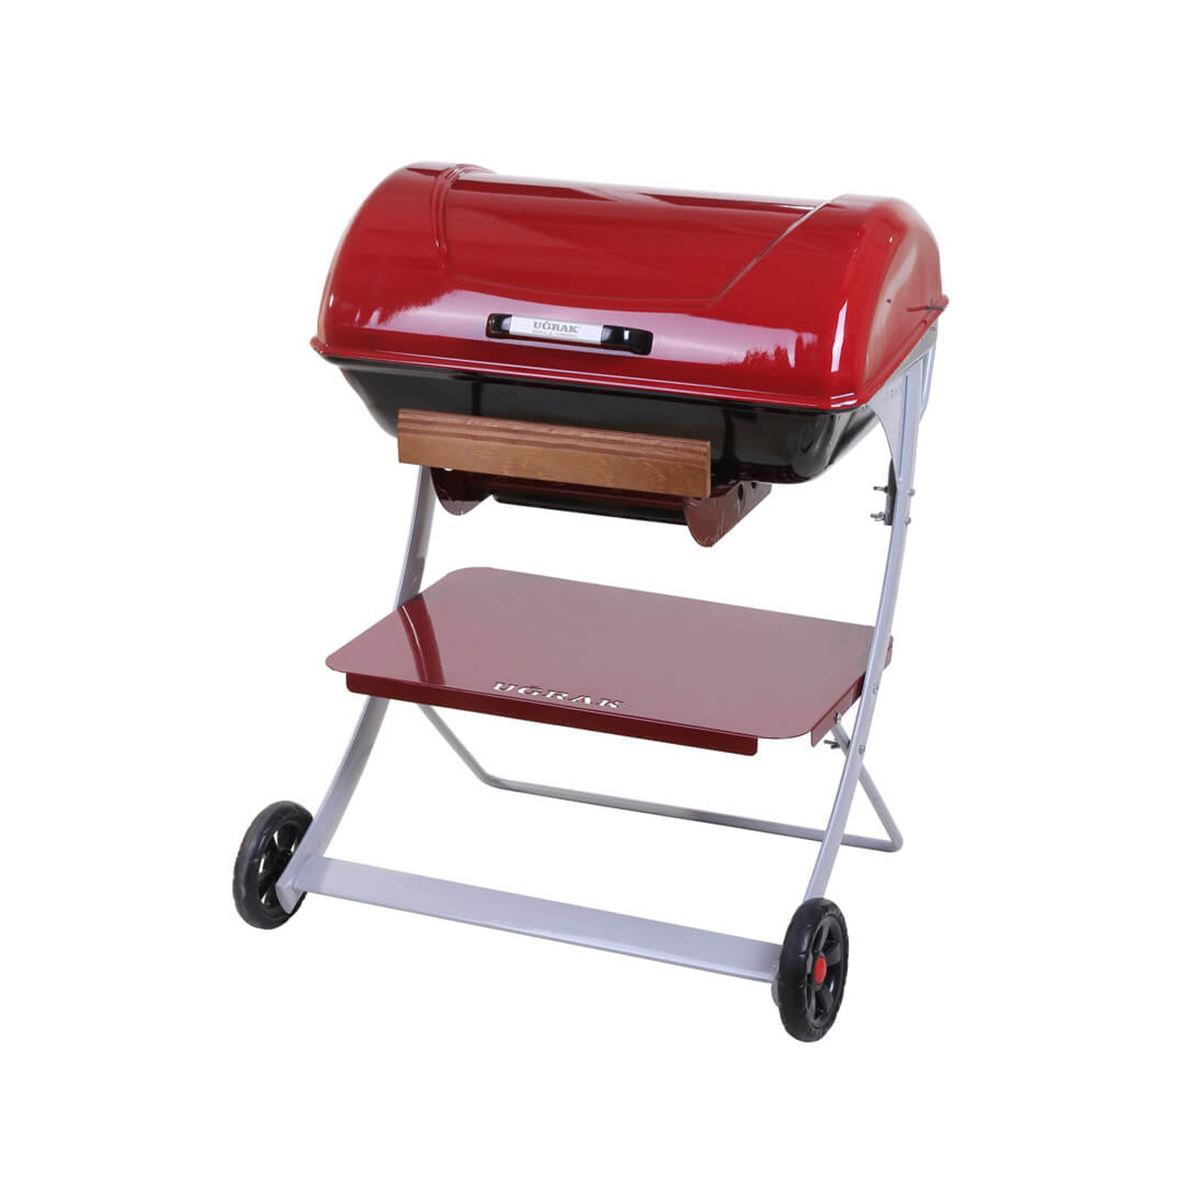 Tekerlekli Kırmızı Barbekü